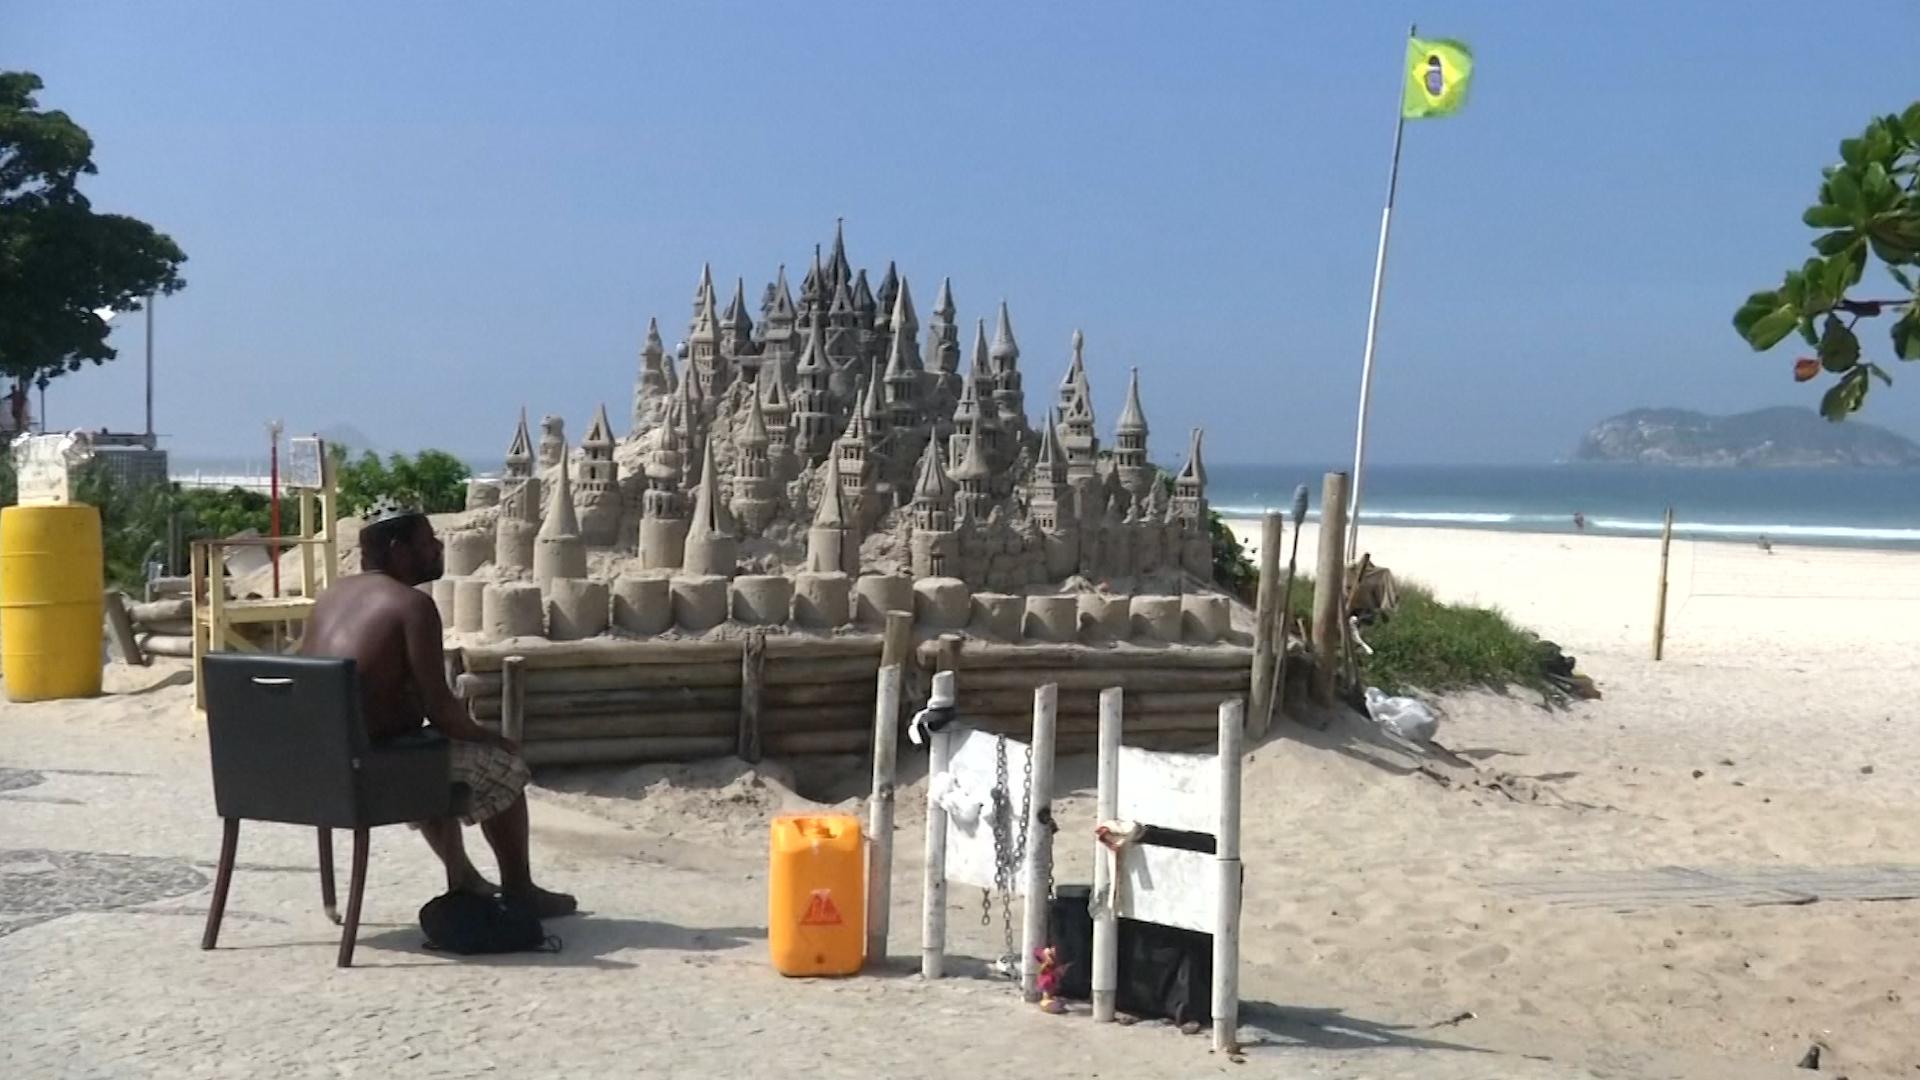 King of a sandcastle in Rio de Janeiro, Brazil.